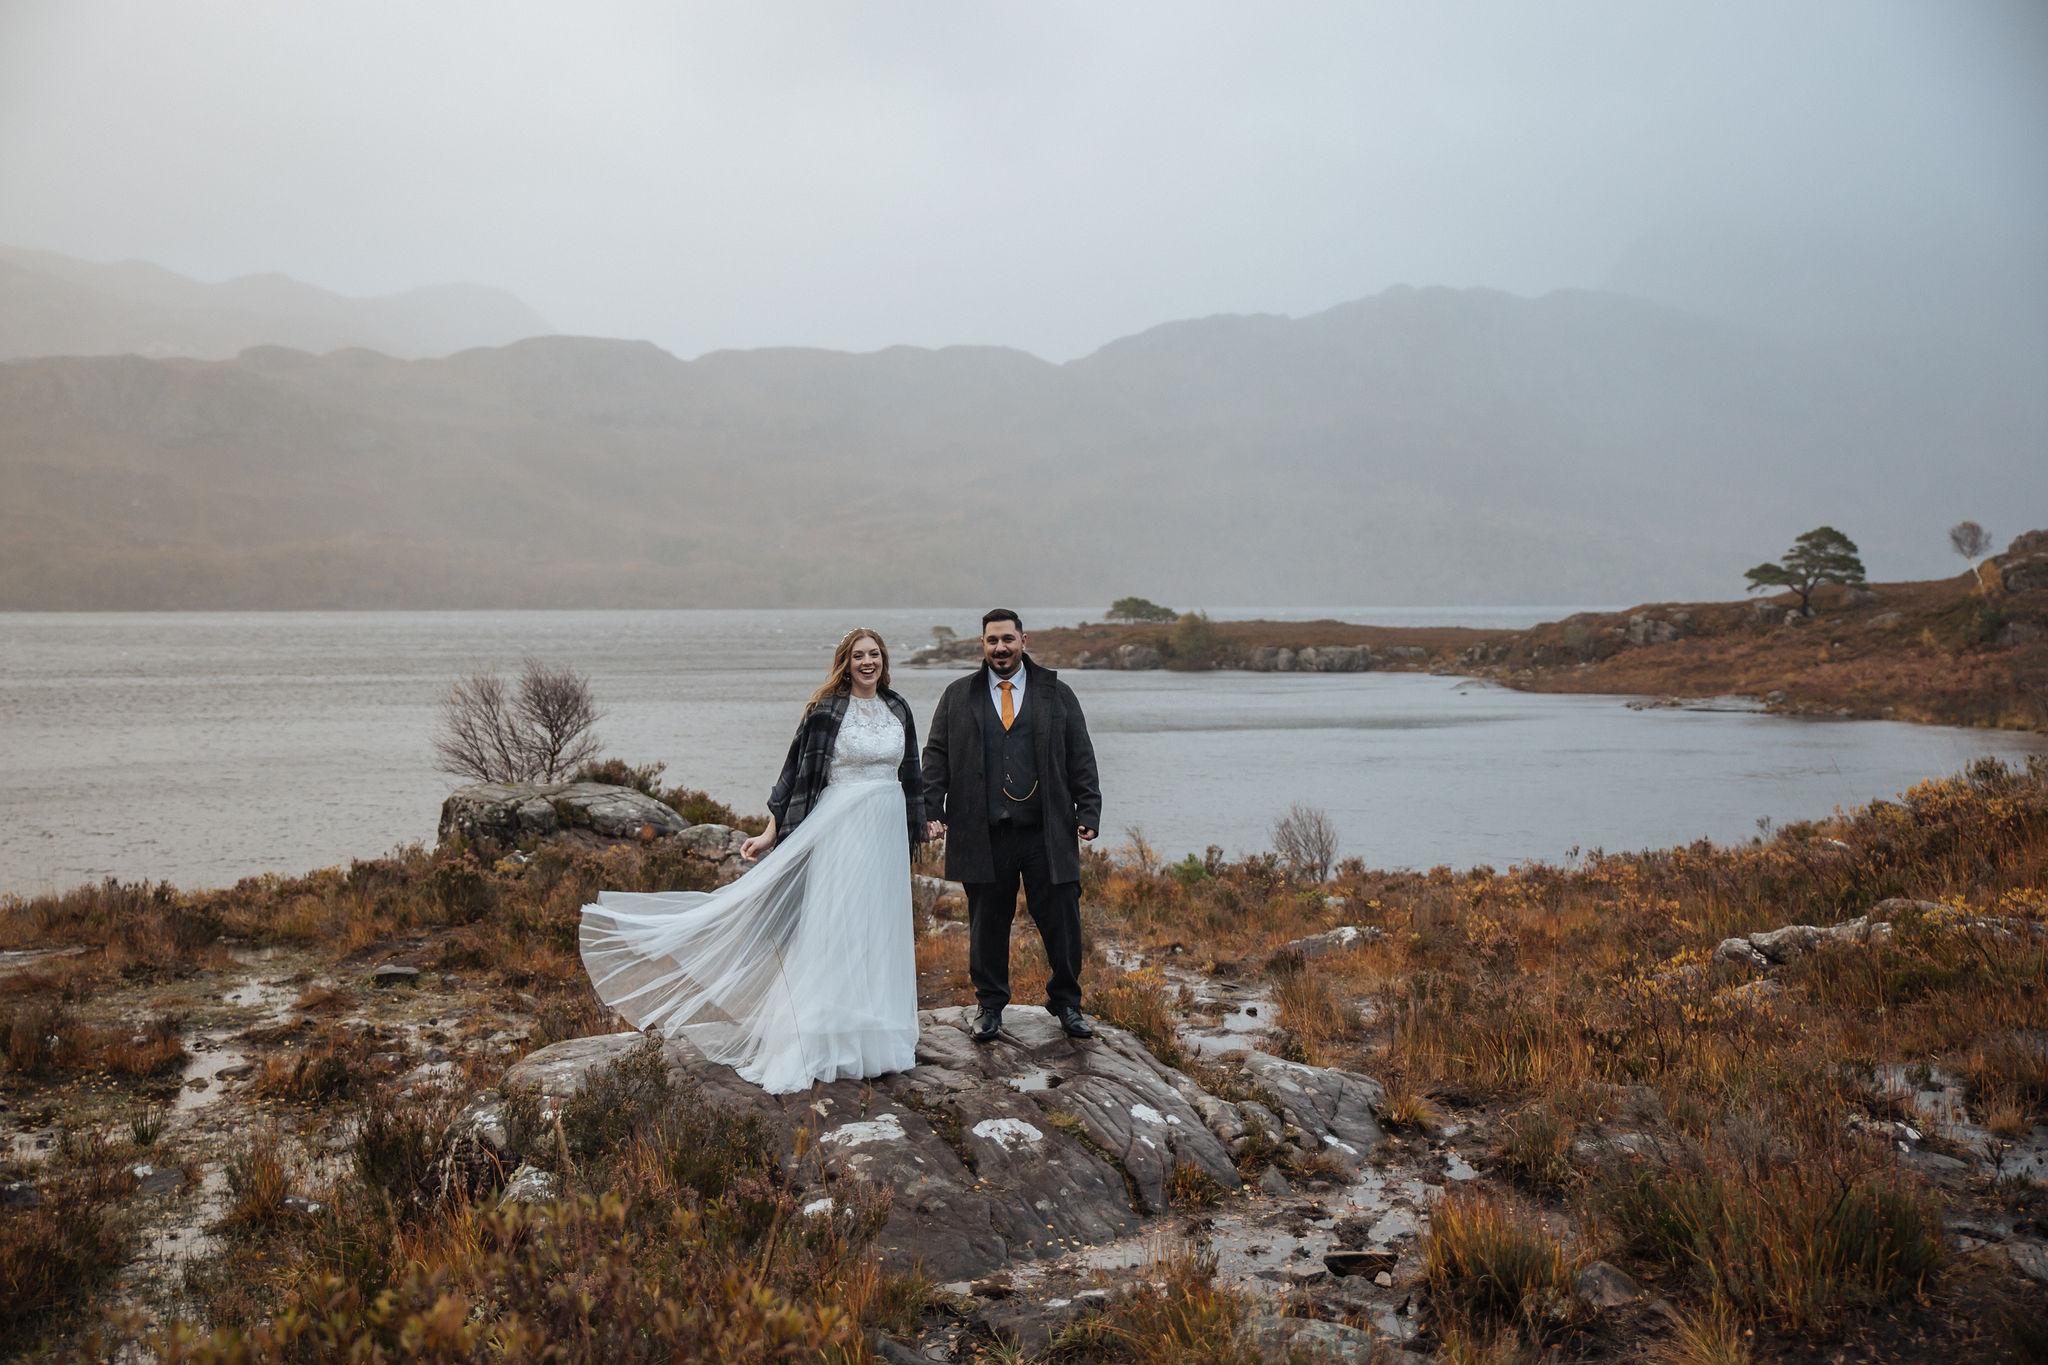 Shieldaig Lodge Elopement - Intimate wedding in Scotland | Torridon Elopement